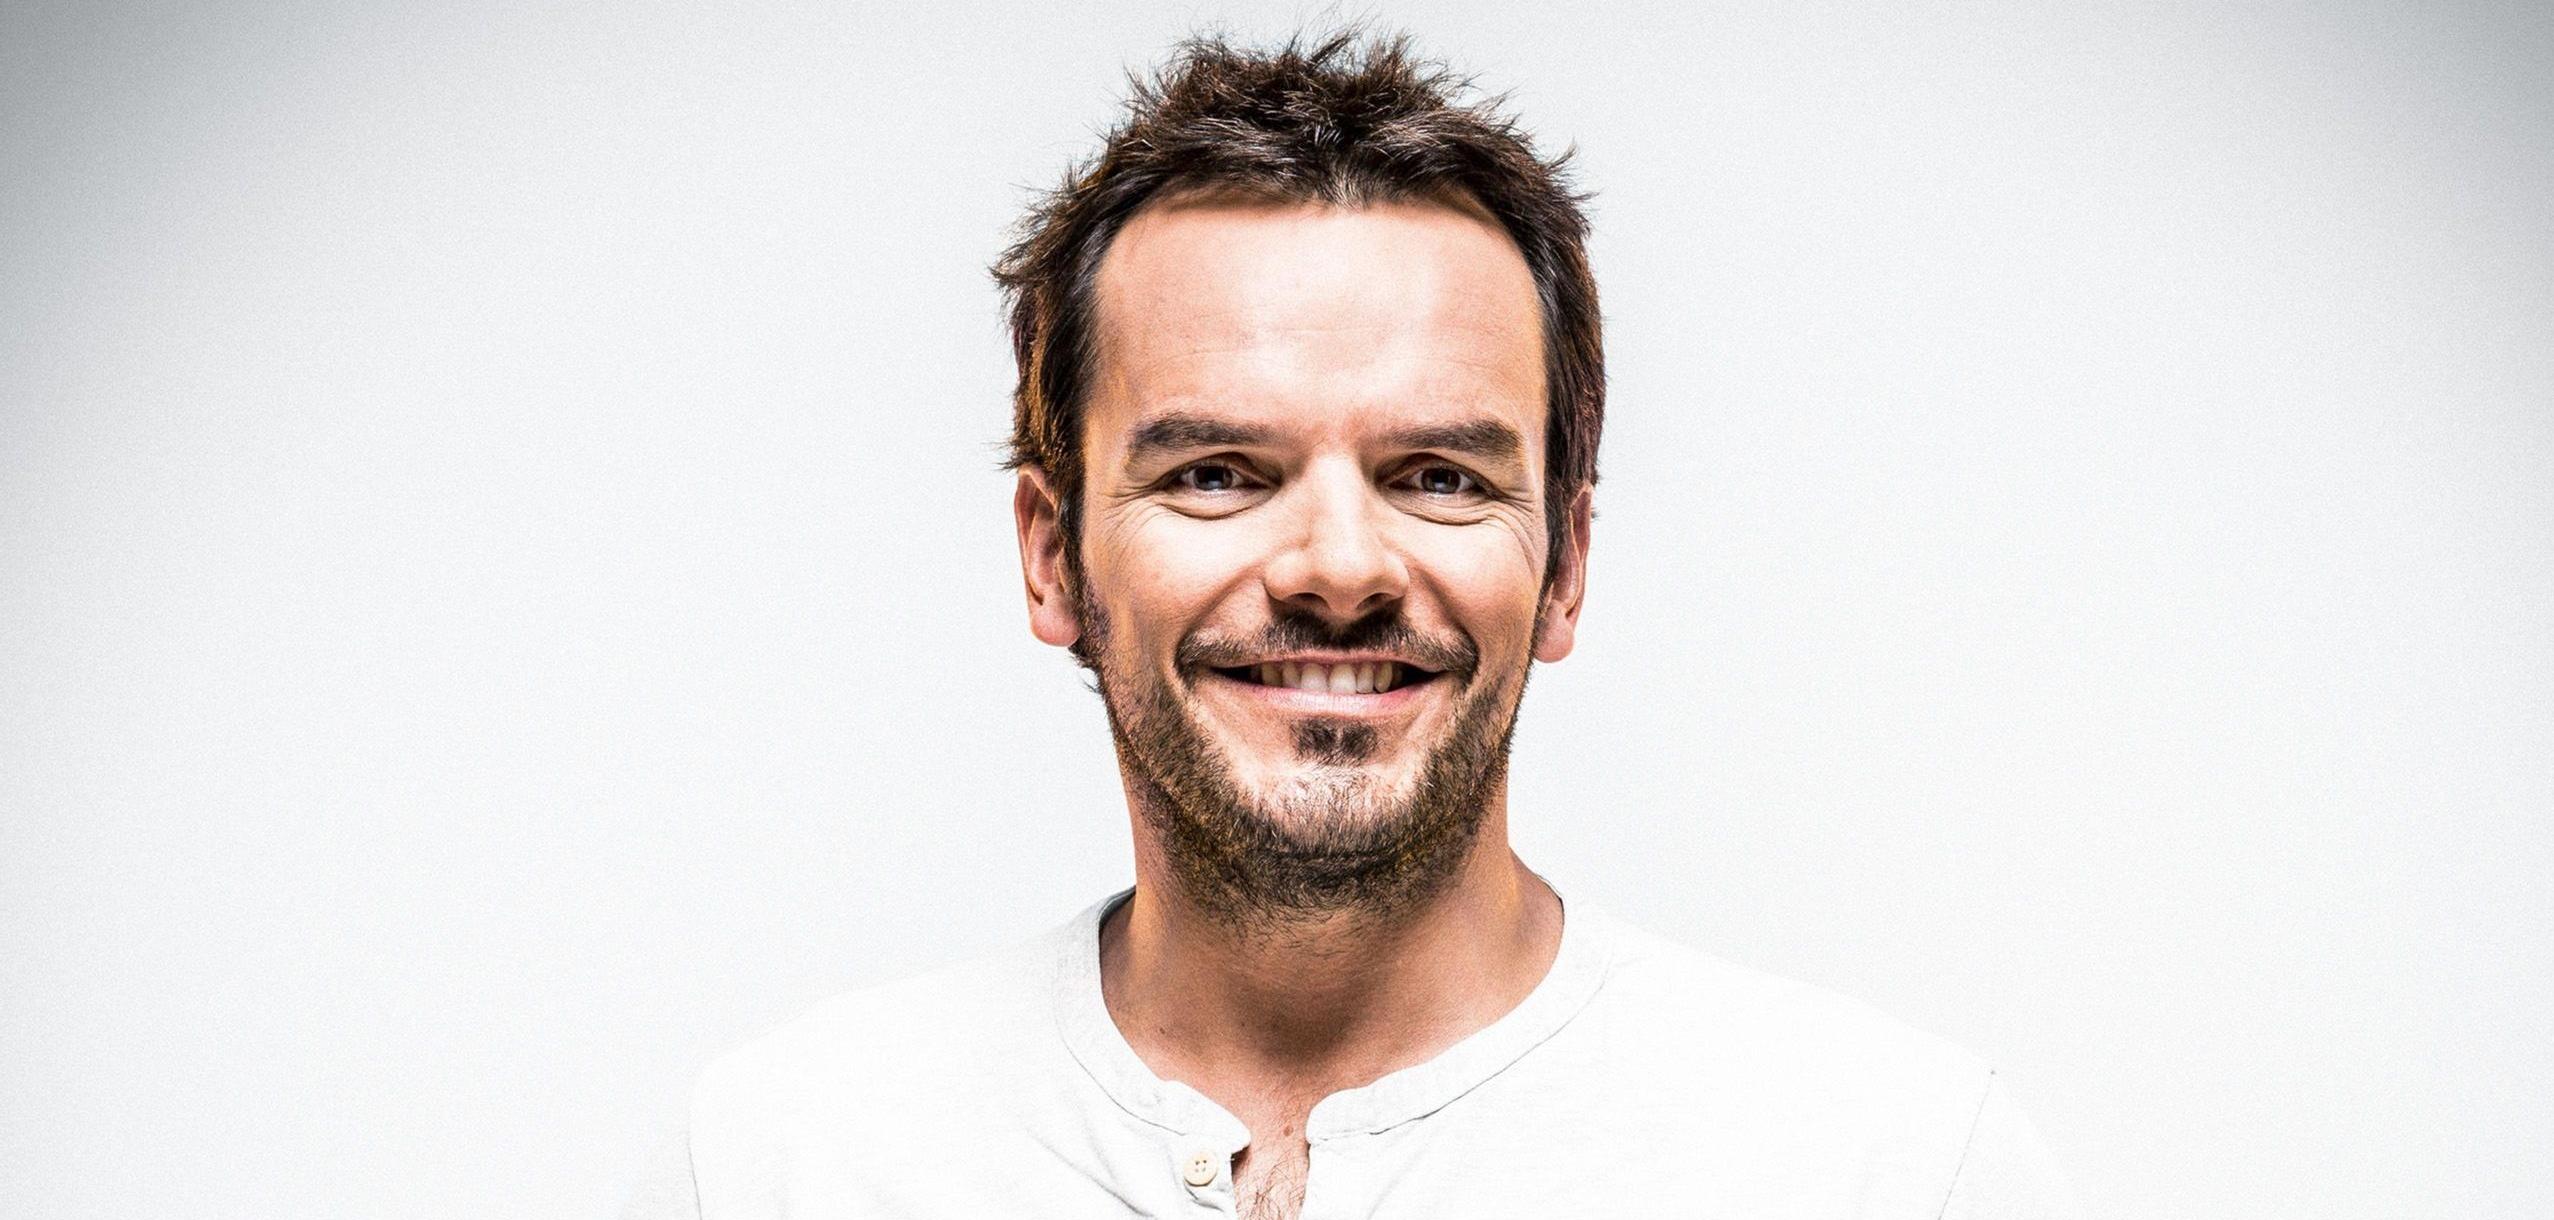 Restauranttester Steffen Henssler